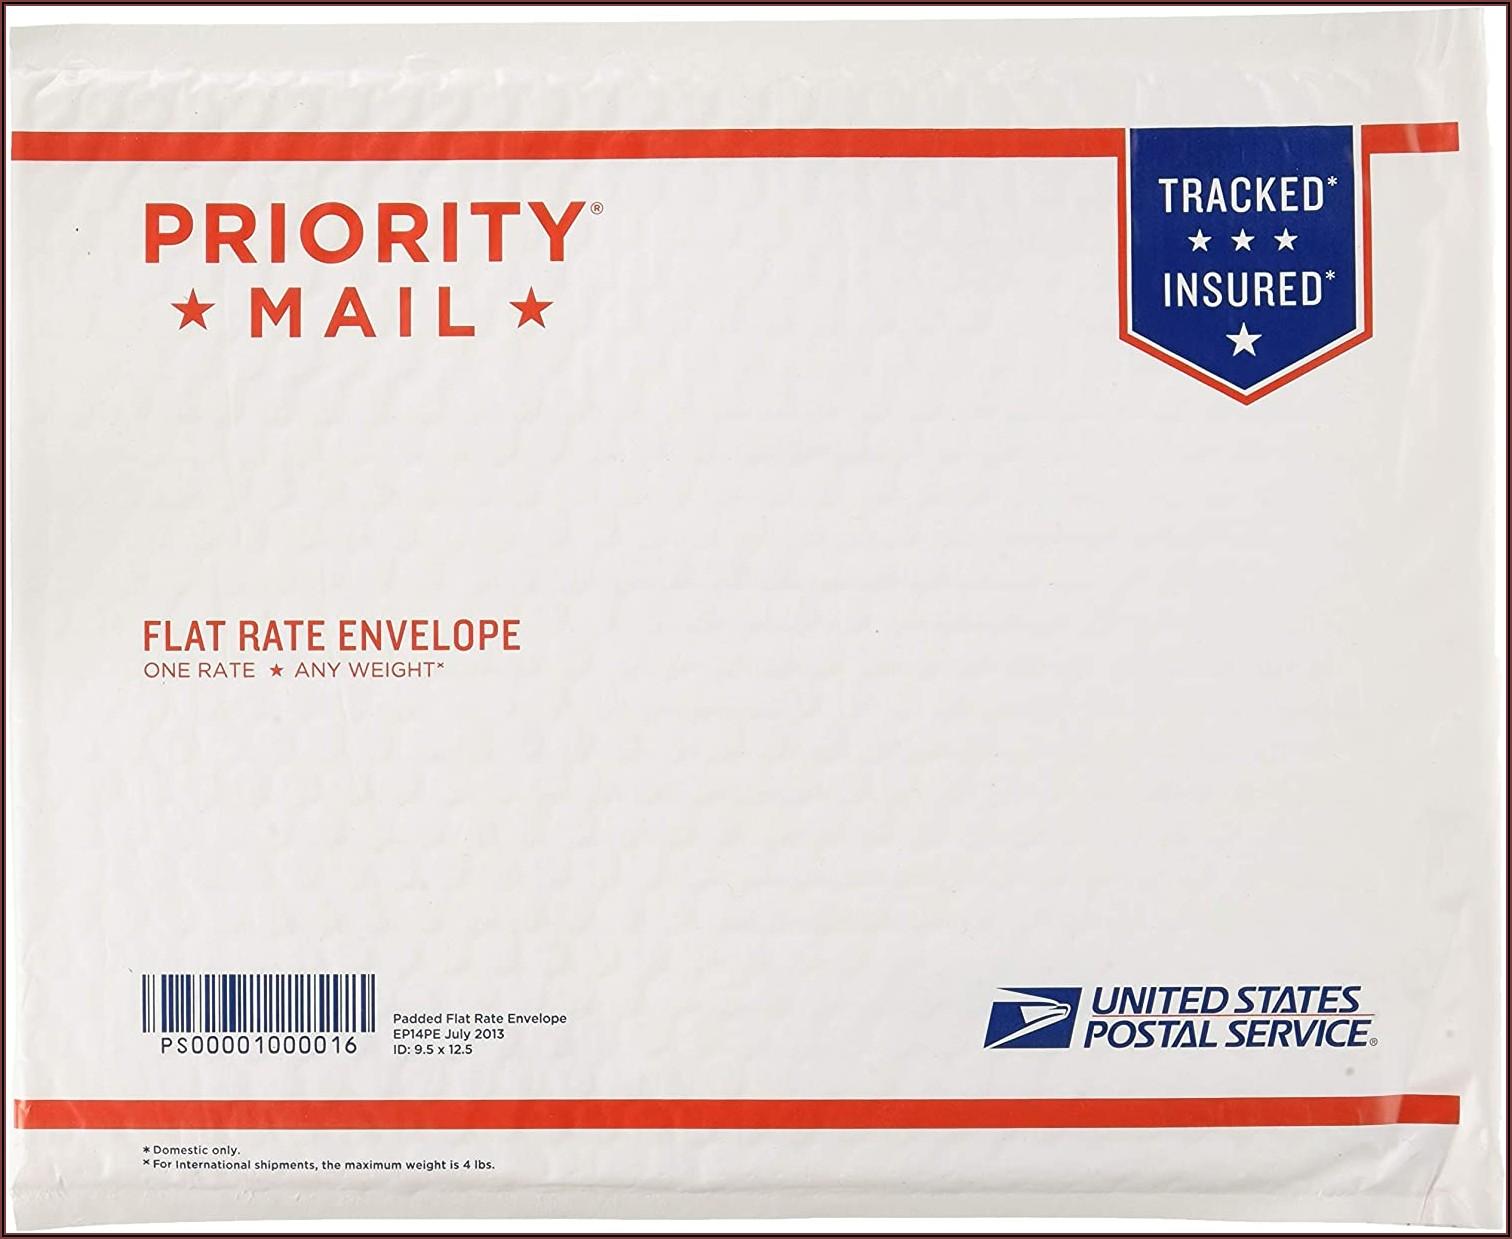 Usps Priority Mail Envelopes Free